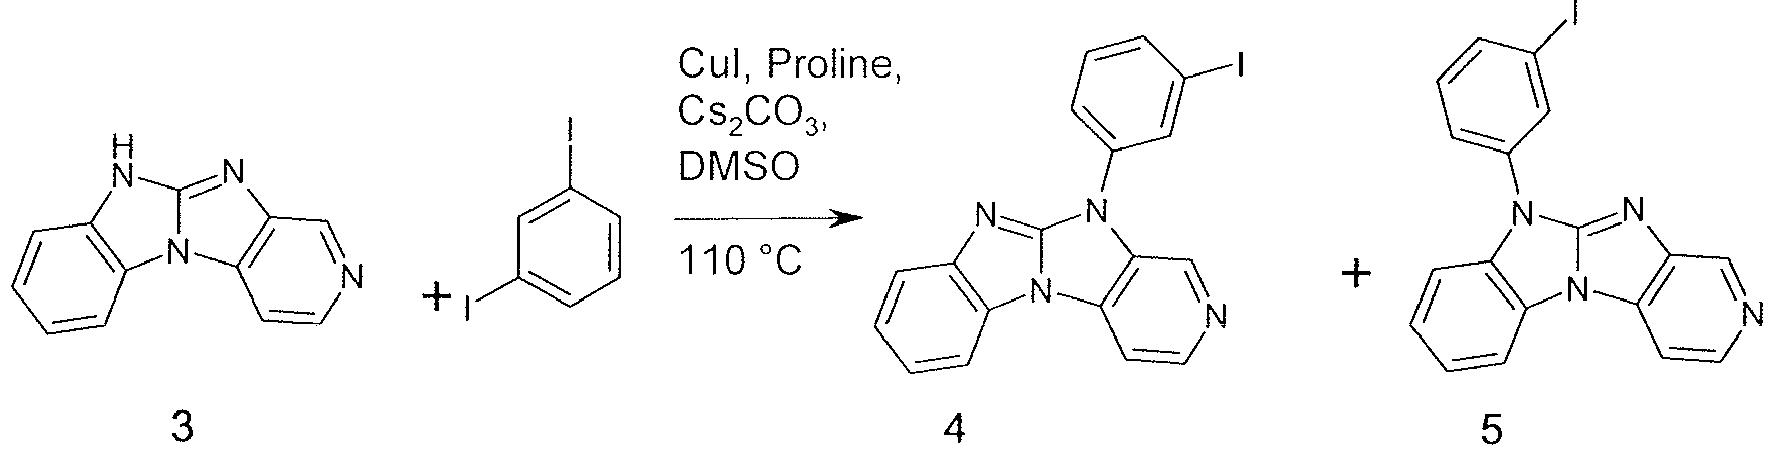 Figure imgb0716